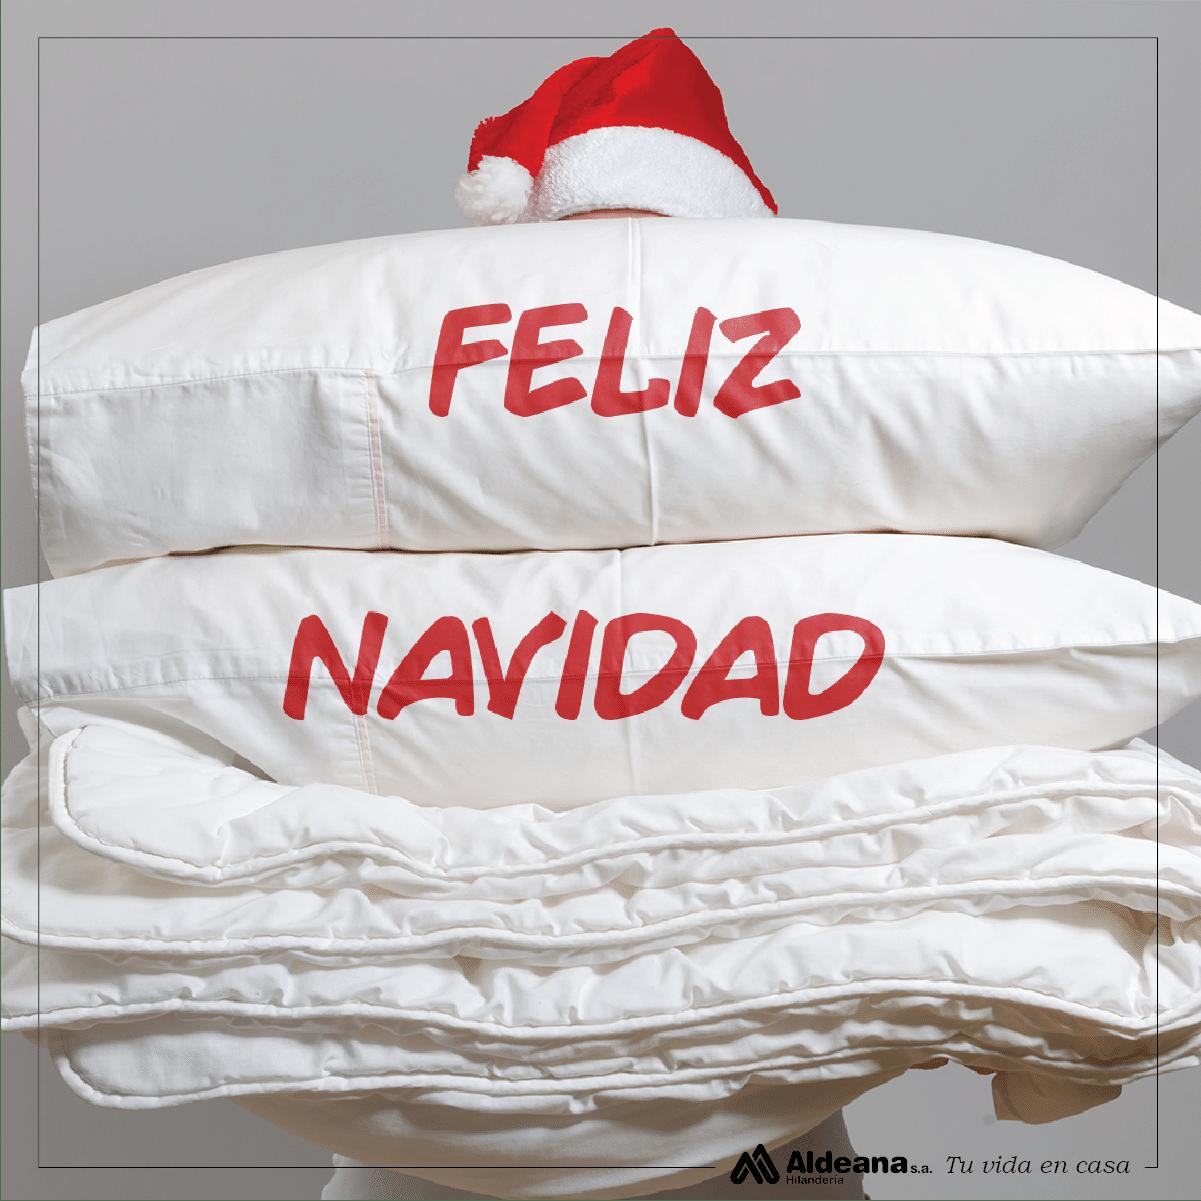 Aldeana - Feliz Navidad